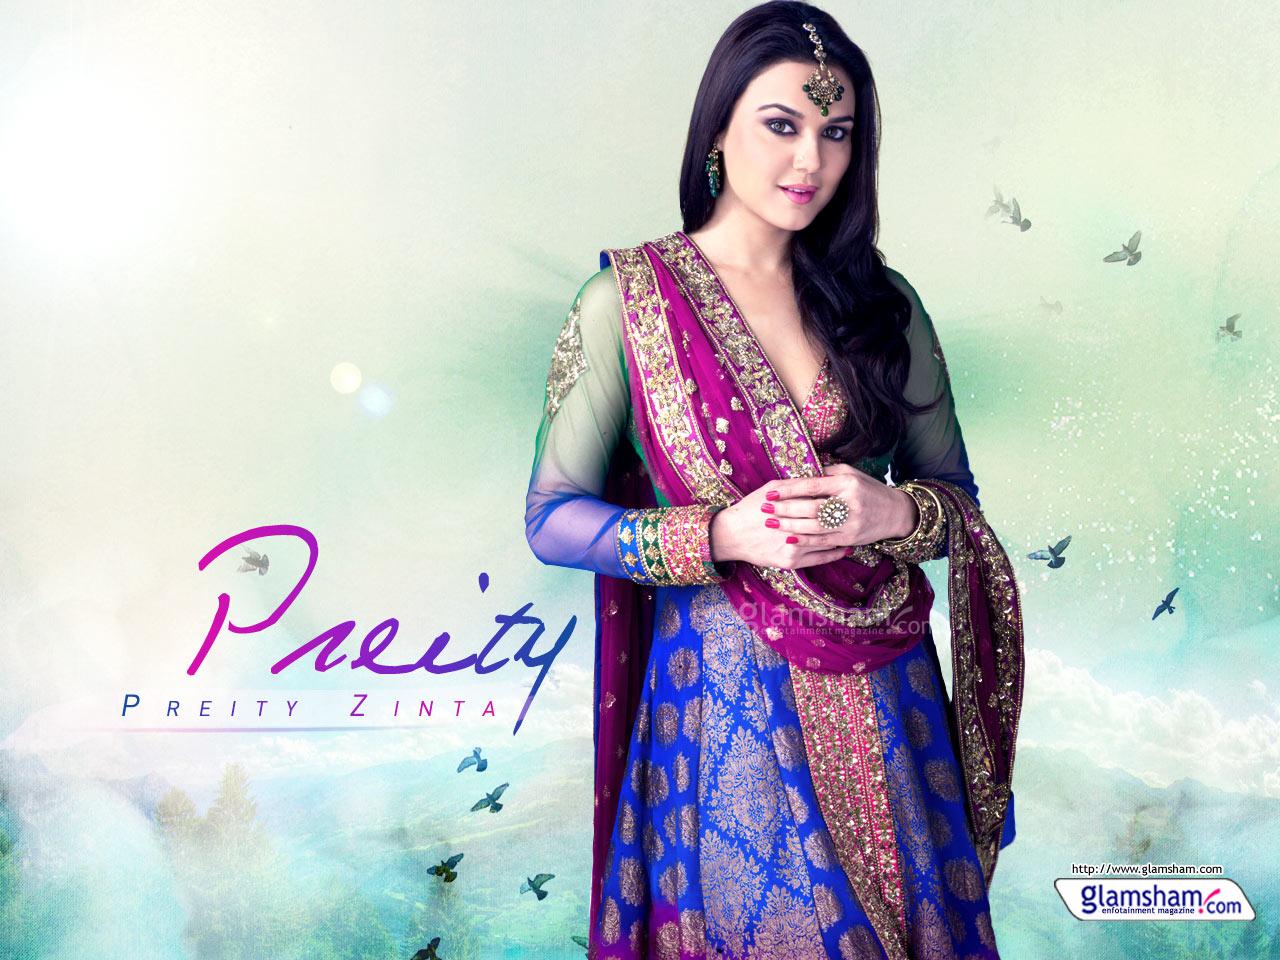 Preity Zinta Wallpaper 1   1280 X 960 stmednet 1280x960